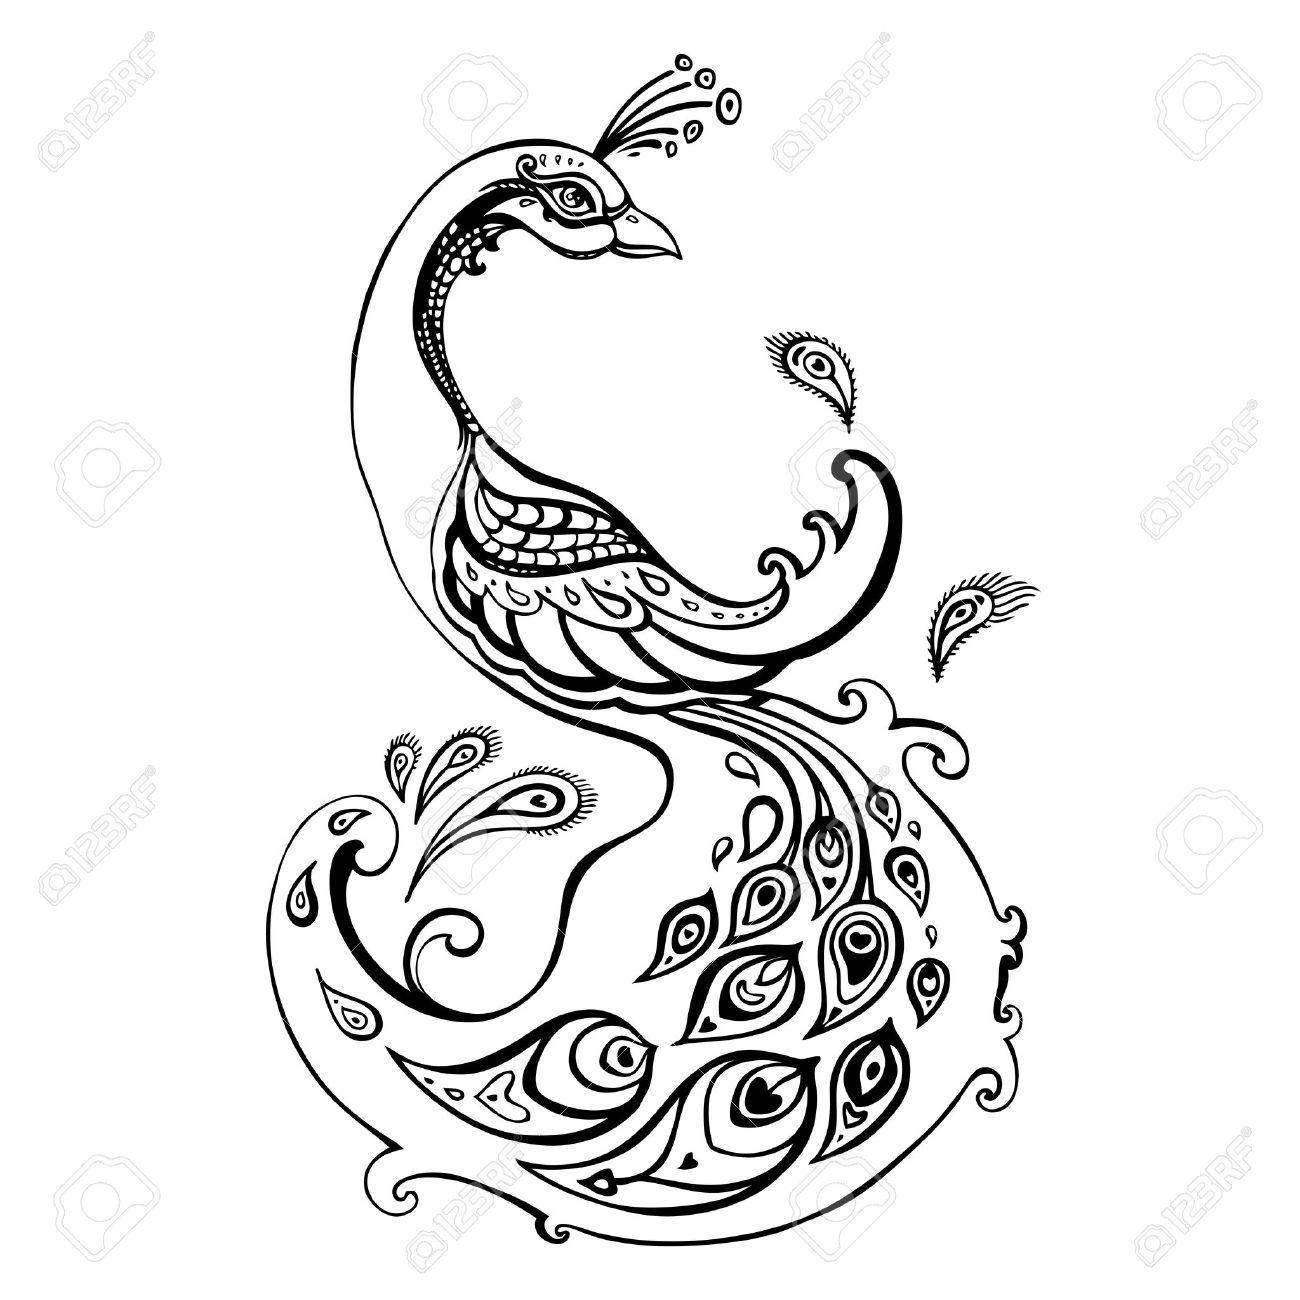 Drawn peacock decorative 27457379 drawn Hand 27457379 Beautiful